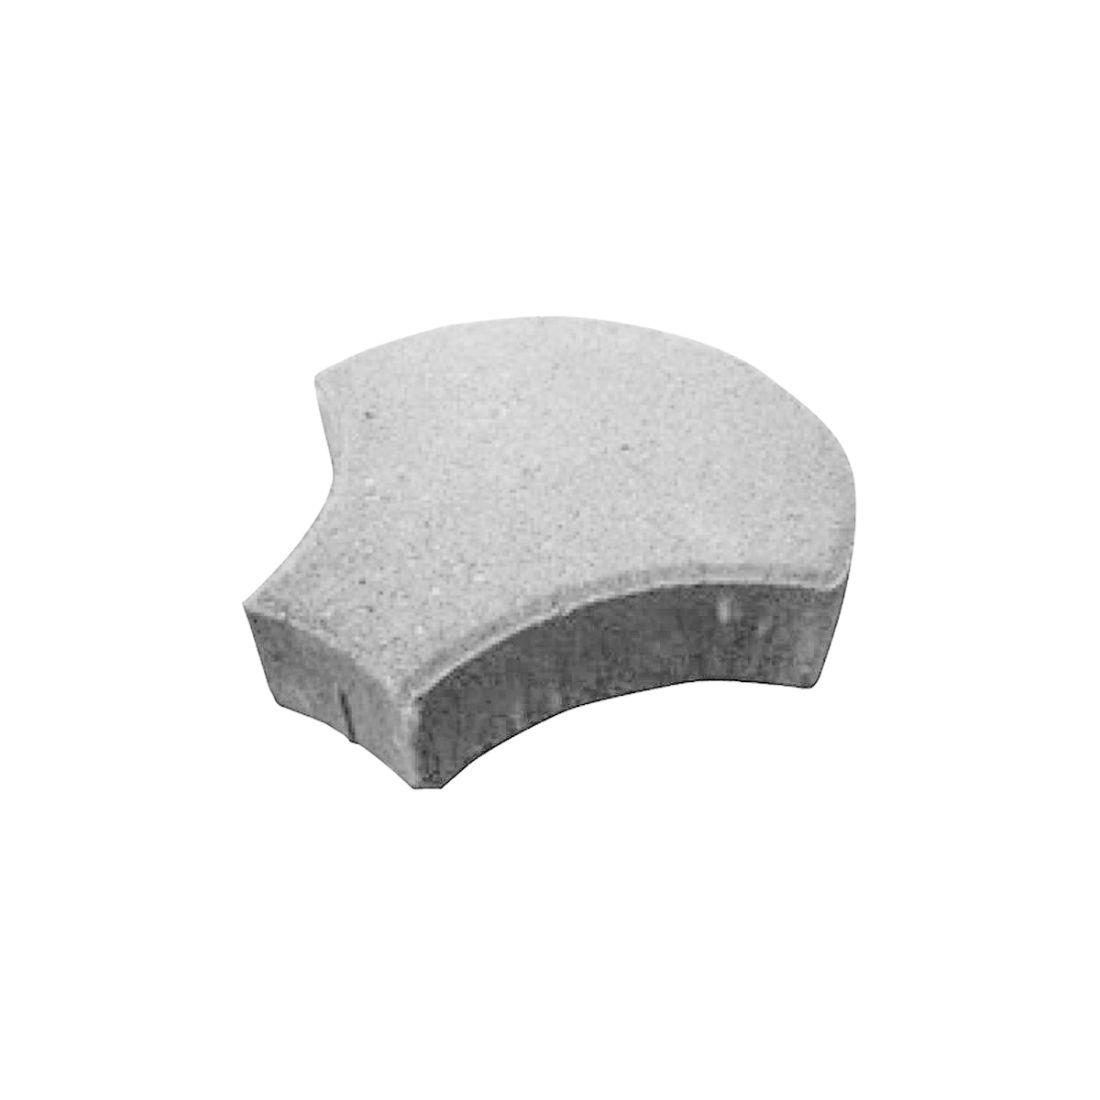 Matakana Concrete Paver 60mm Ash